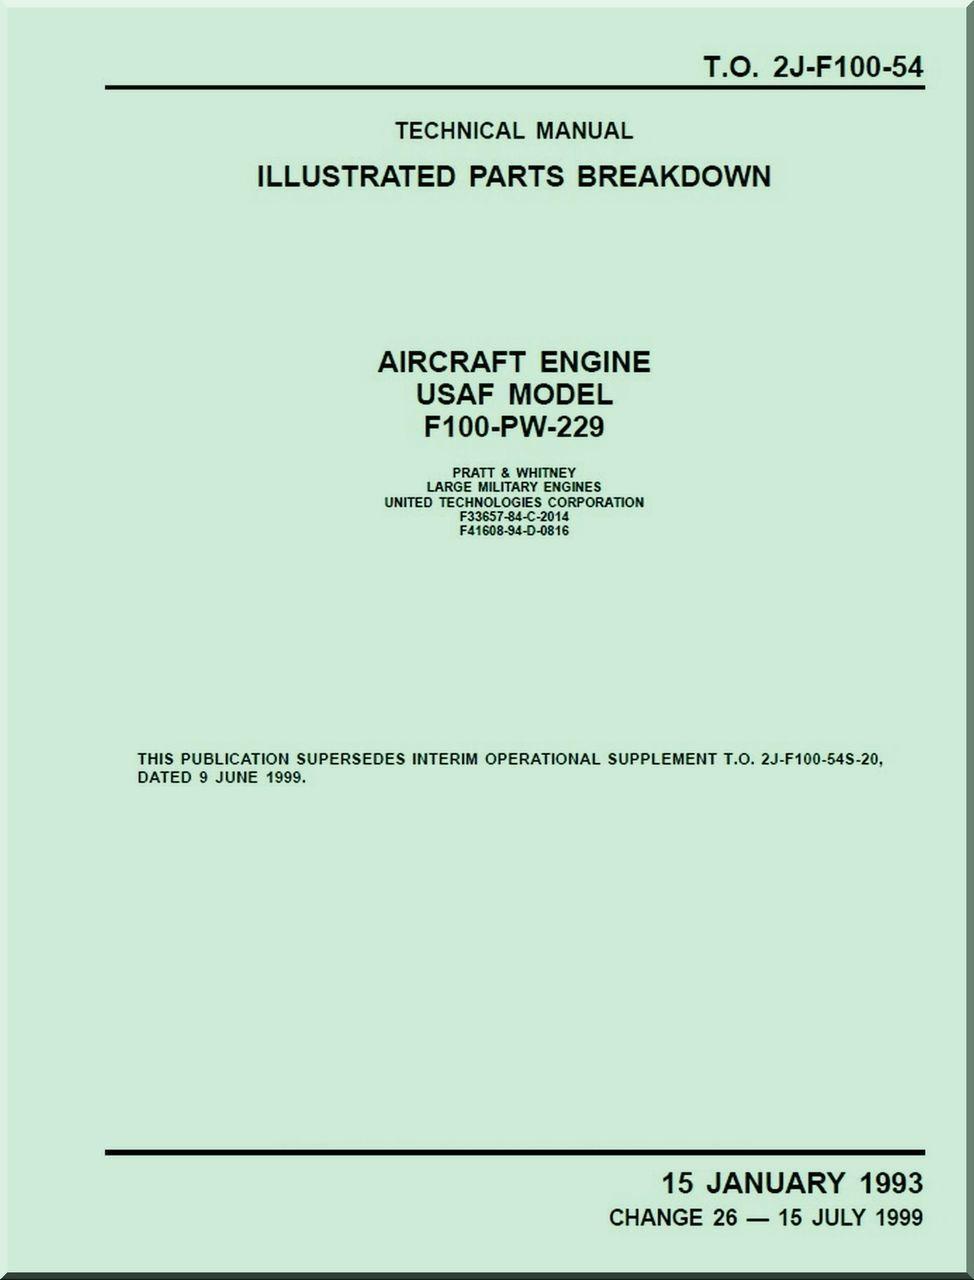 pratt whitney f100 pw 229 aircraft engines illustrated parts rh pinterest co uk F103 Aircraft Thunderbird Aircraft